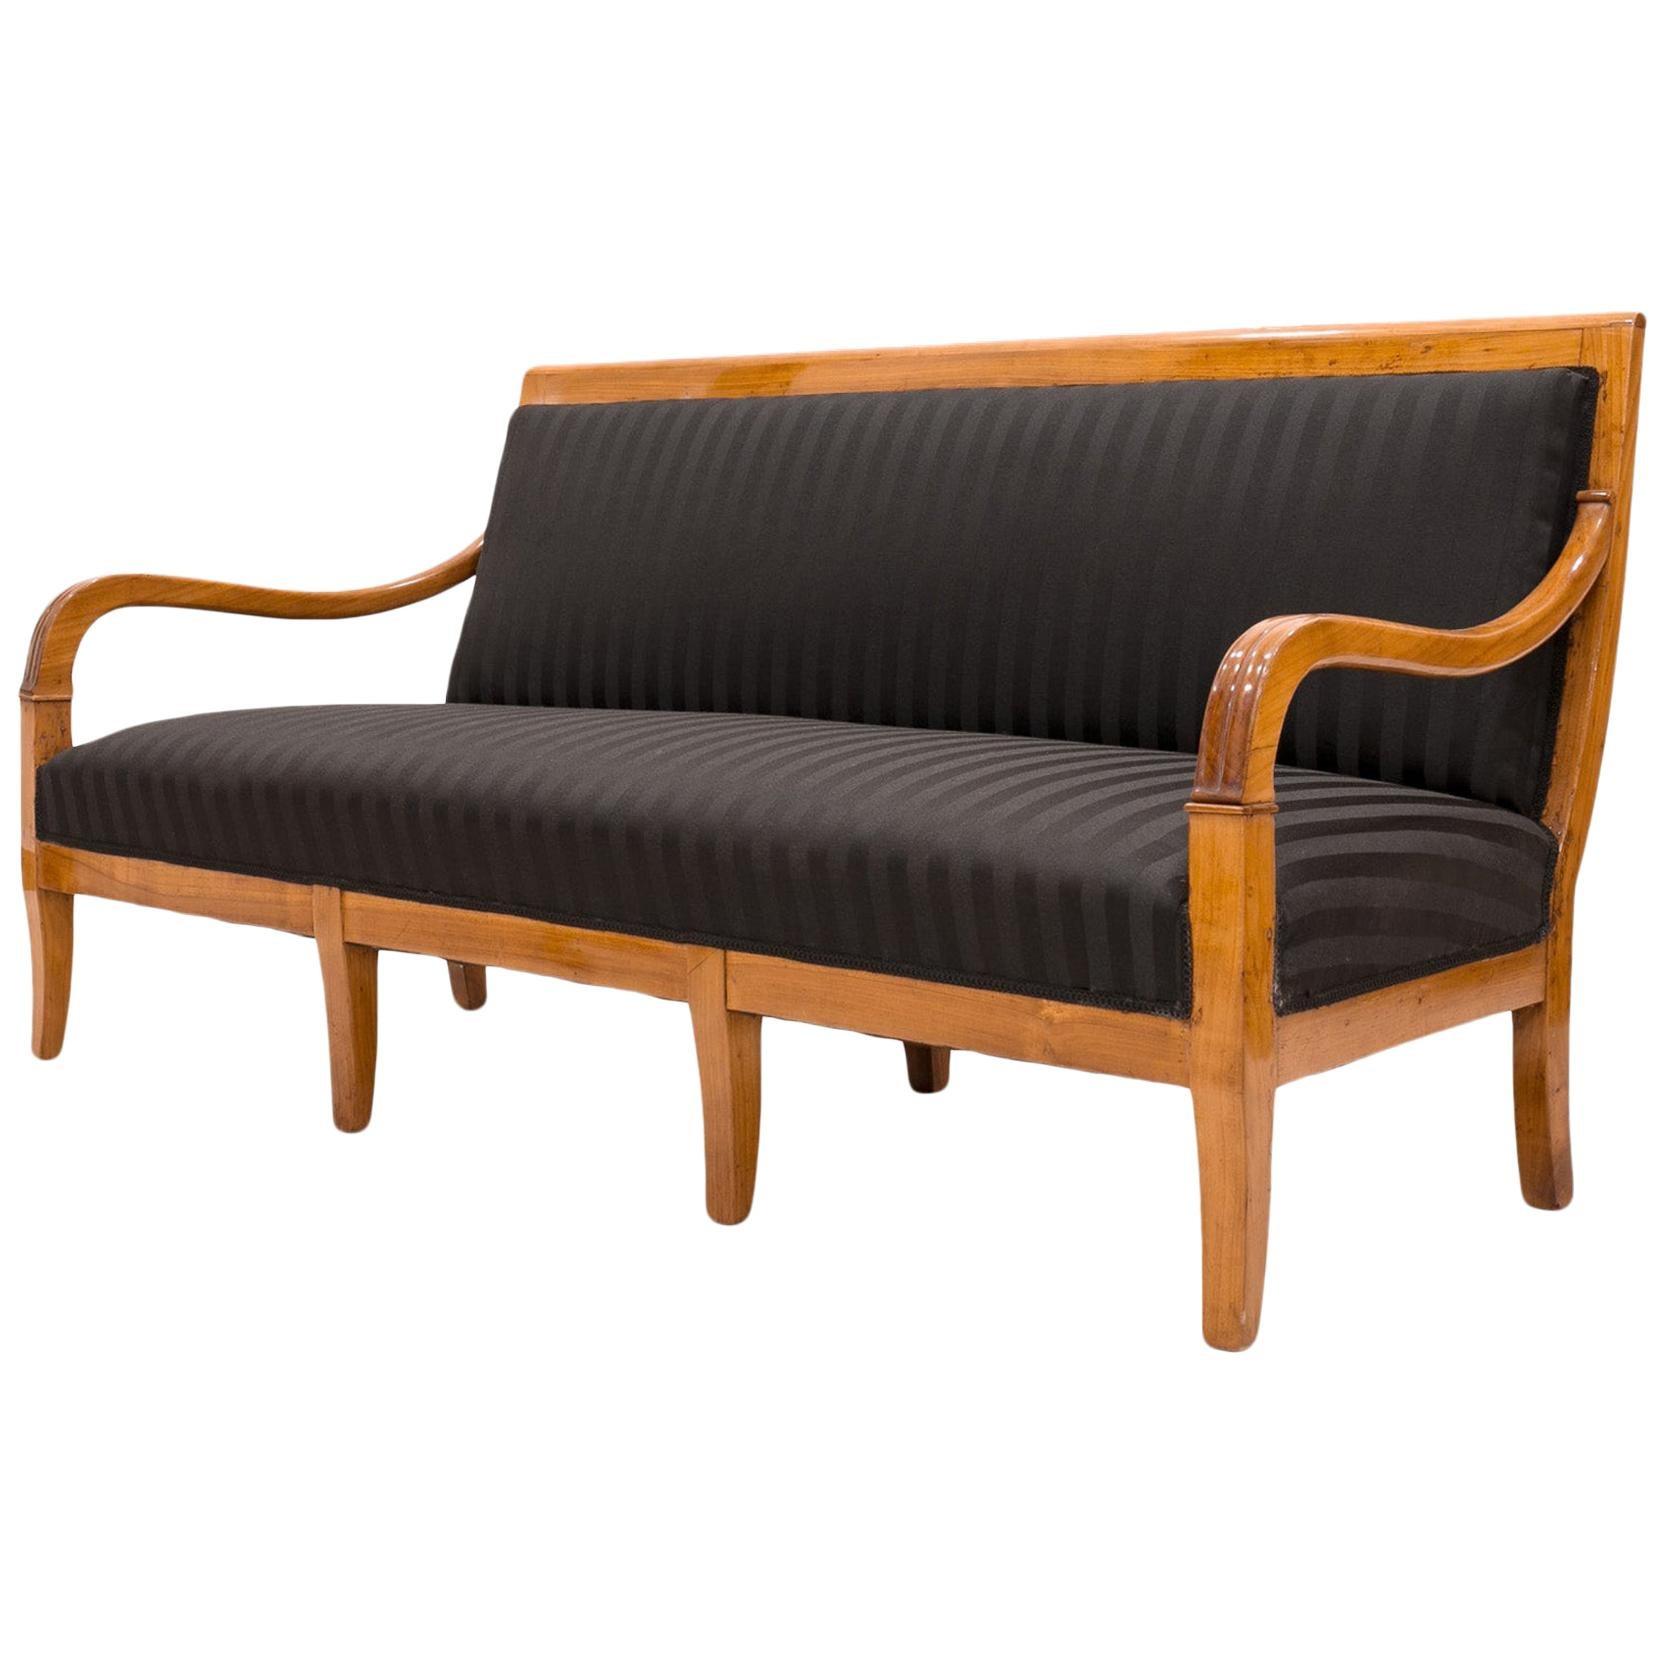 Biedermeier Sofa, France, 19th Century